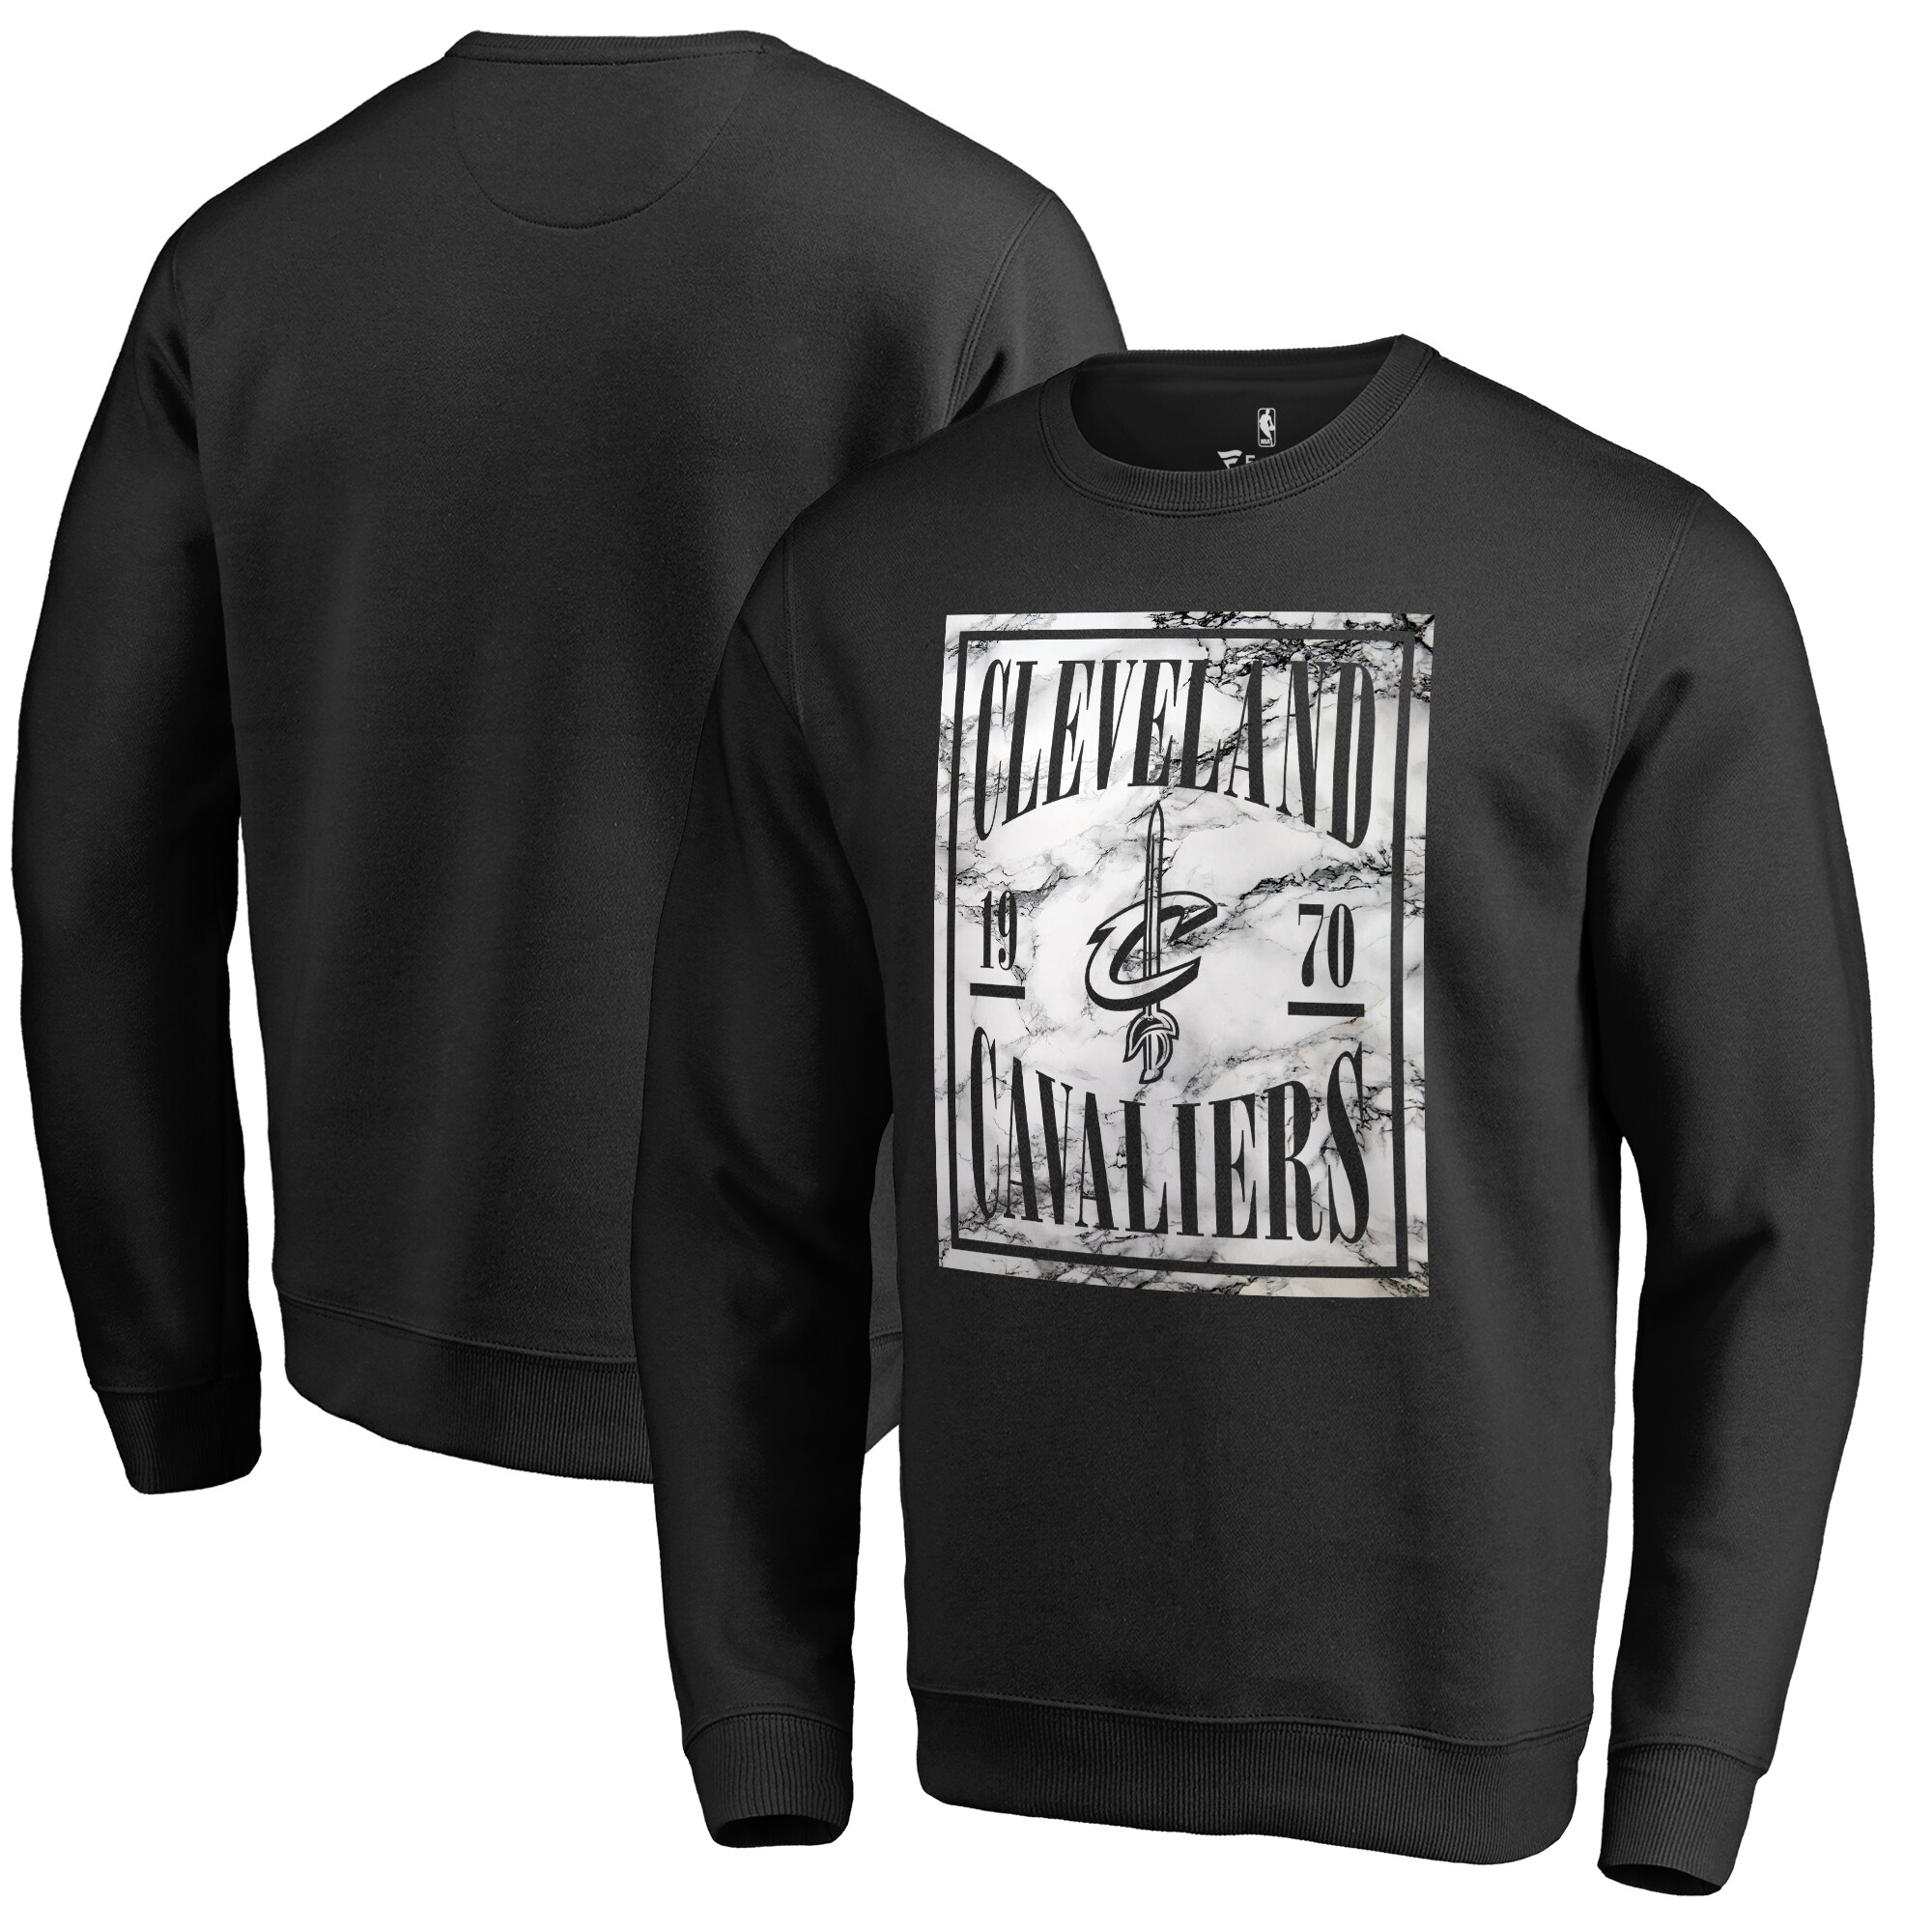 Cleveland Cavaliers Fanatics Branded Court Vision Crew Sweatshirt - Black